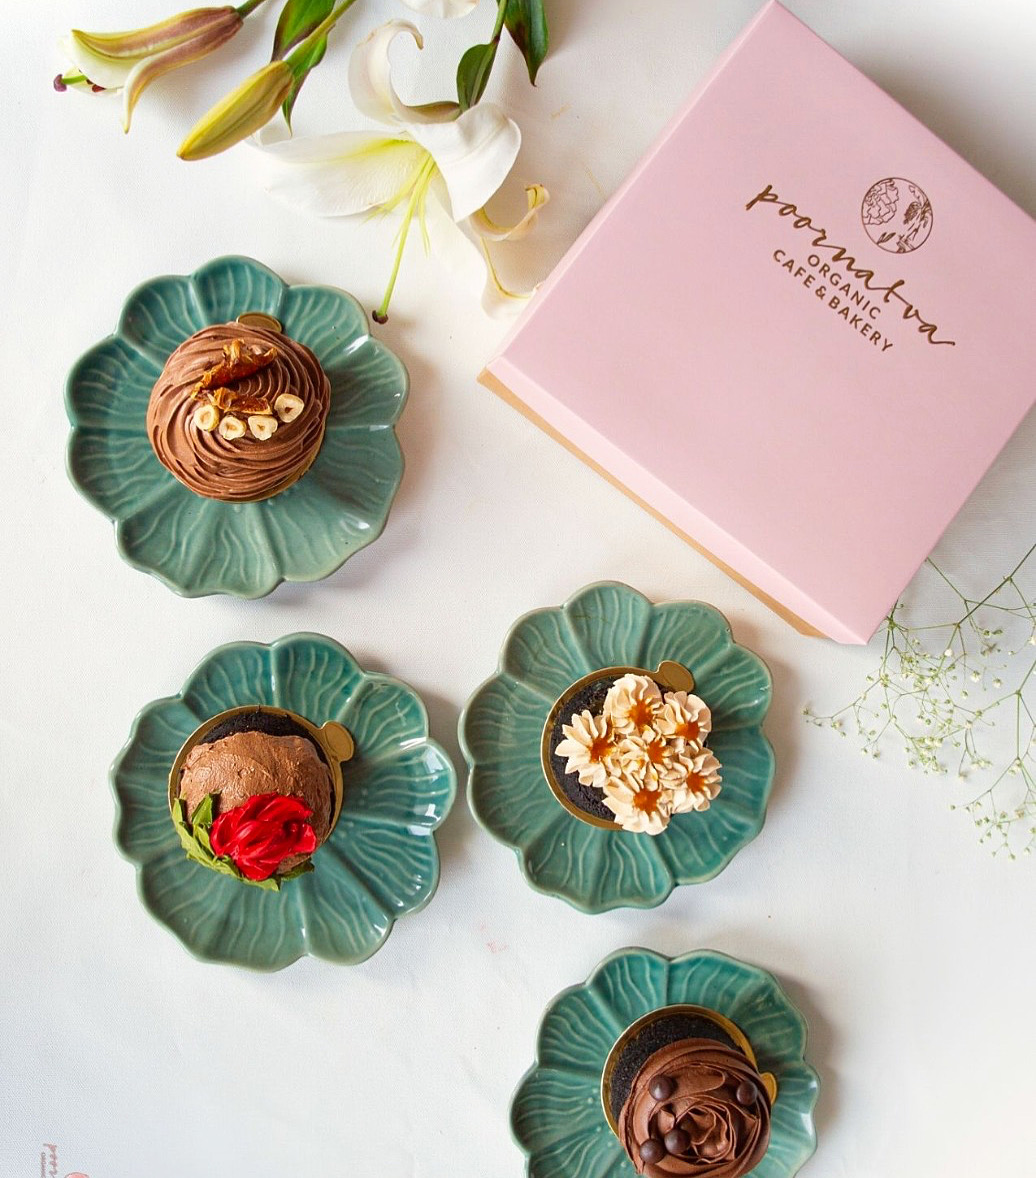 Assorted Chocolate Mini Cakes Gift Box